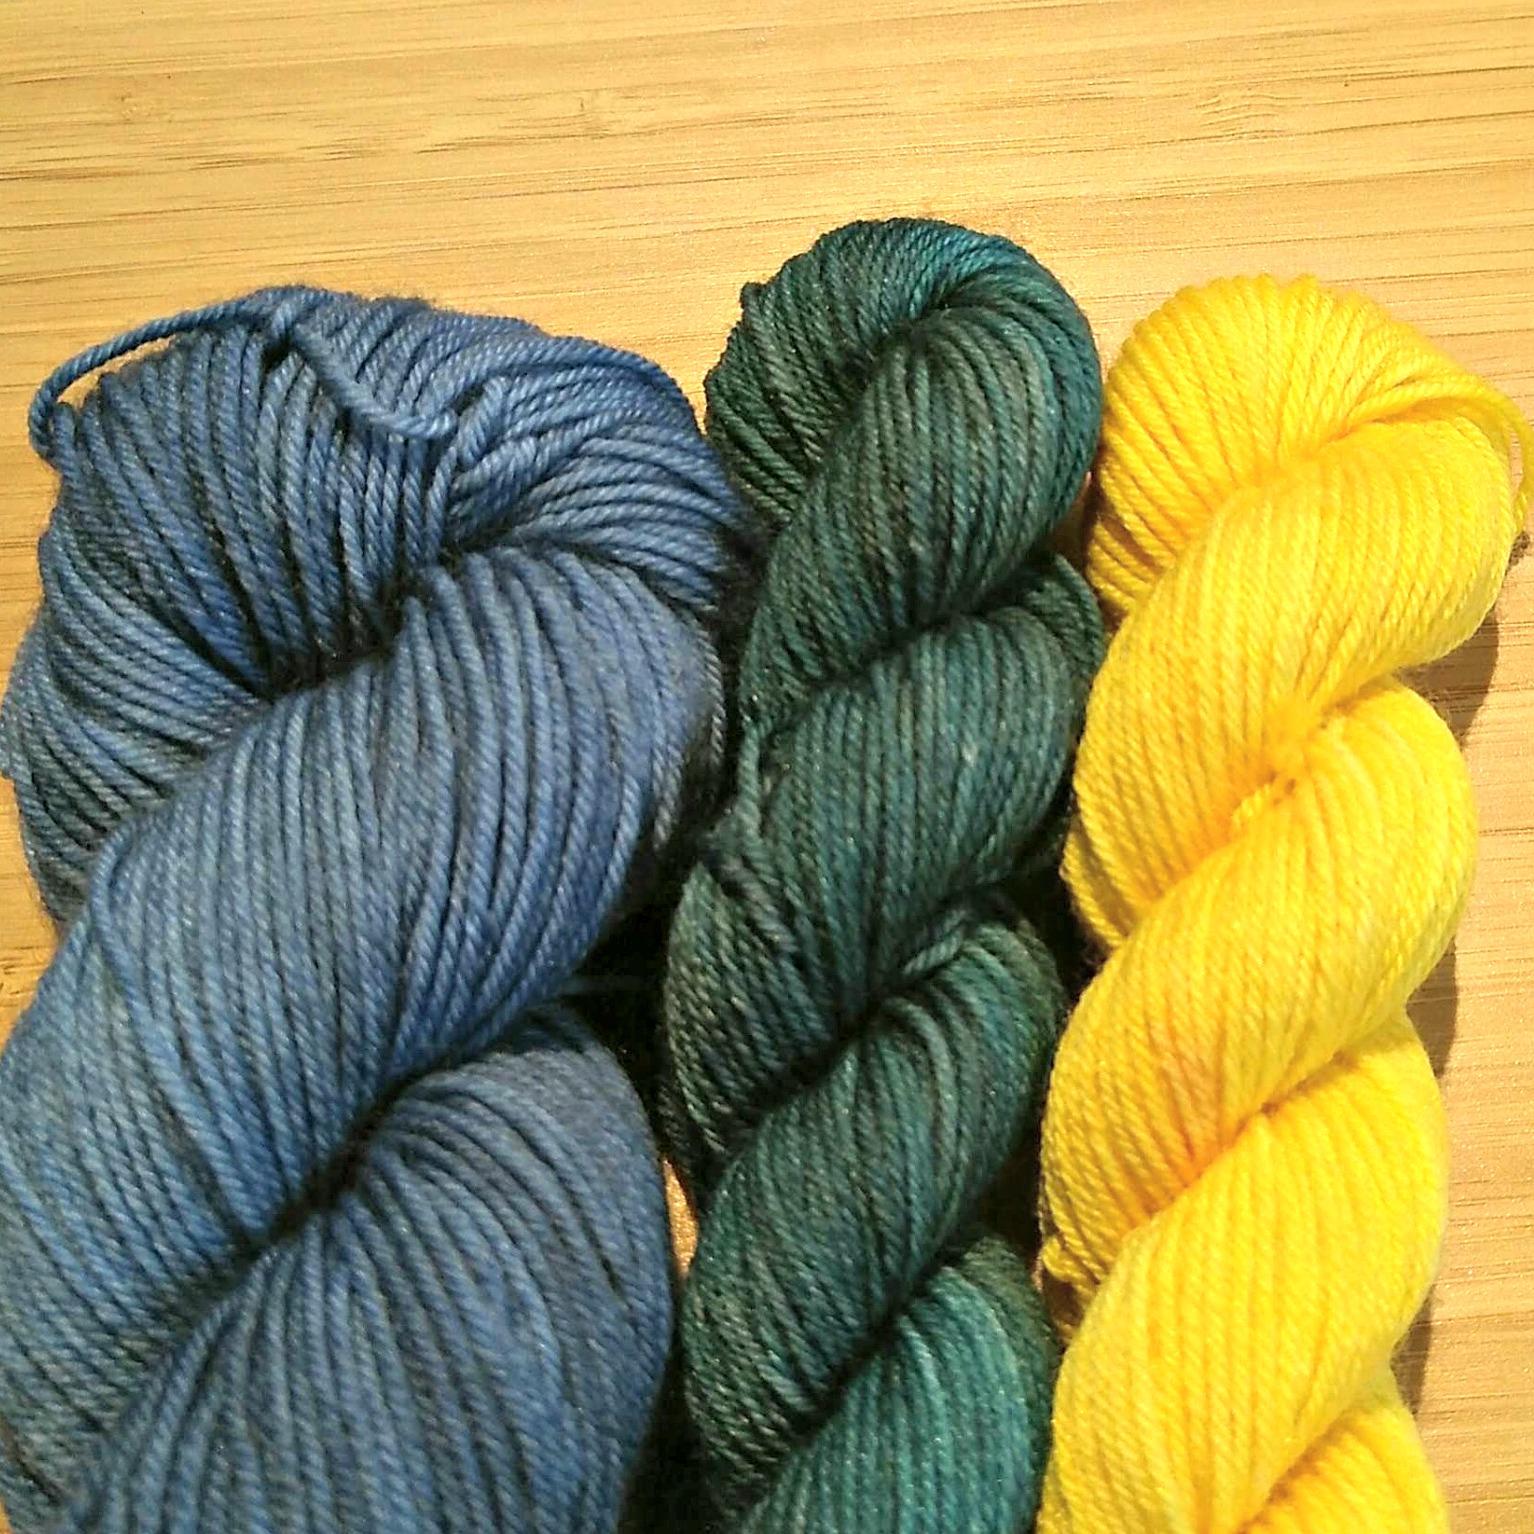 Blå, mörkgrön, gul